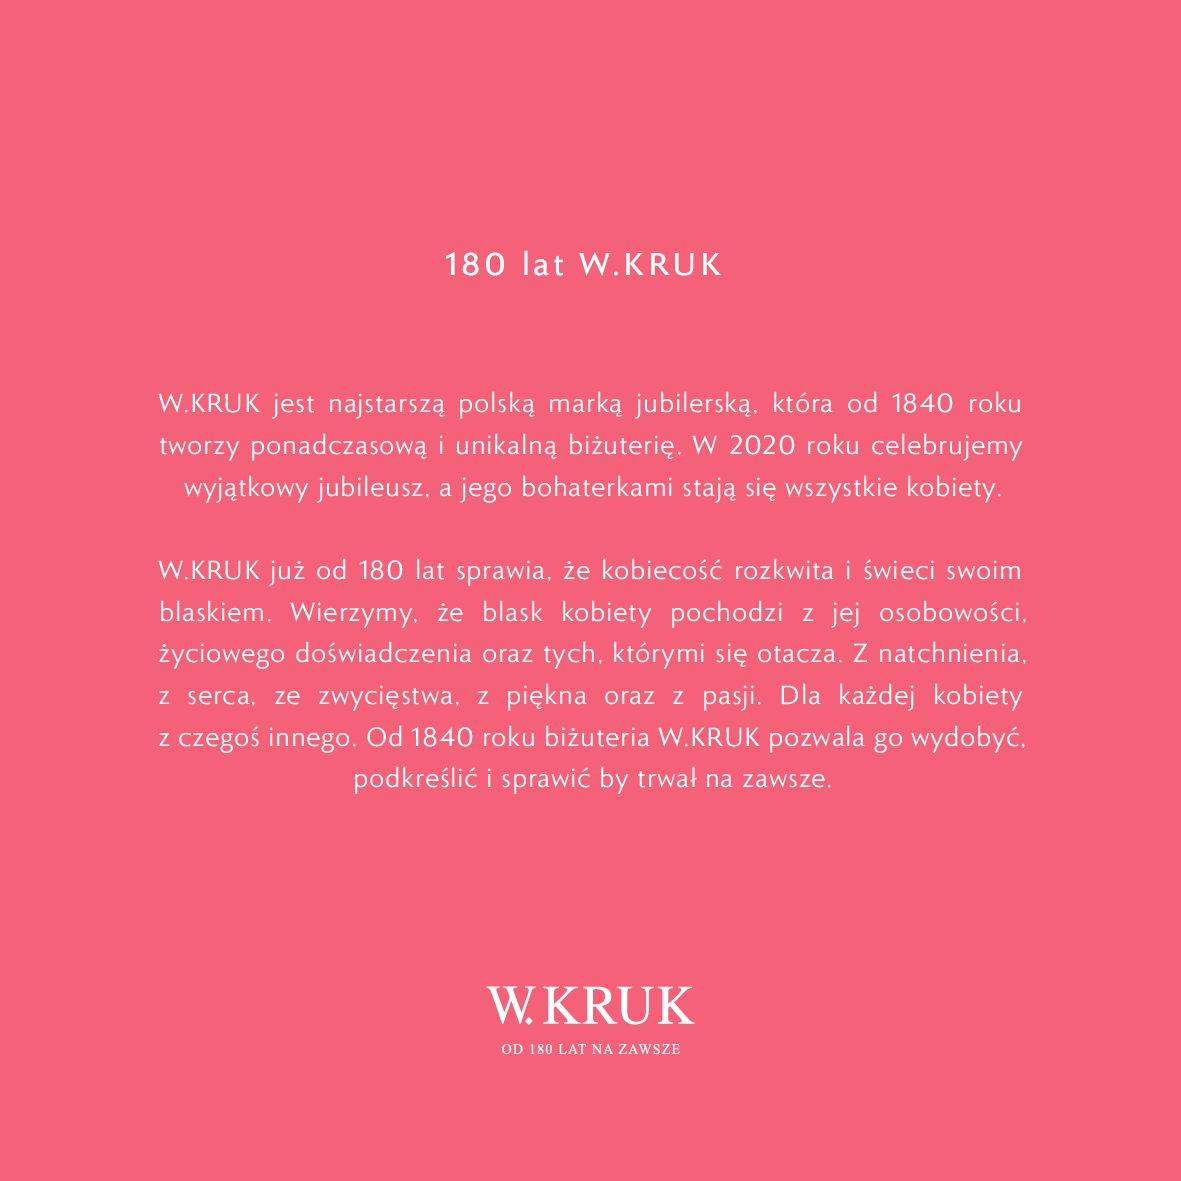 Gazetka W. KRUK: Katalog - Kolekcja Blask 2021-02-17 page-2